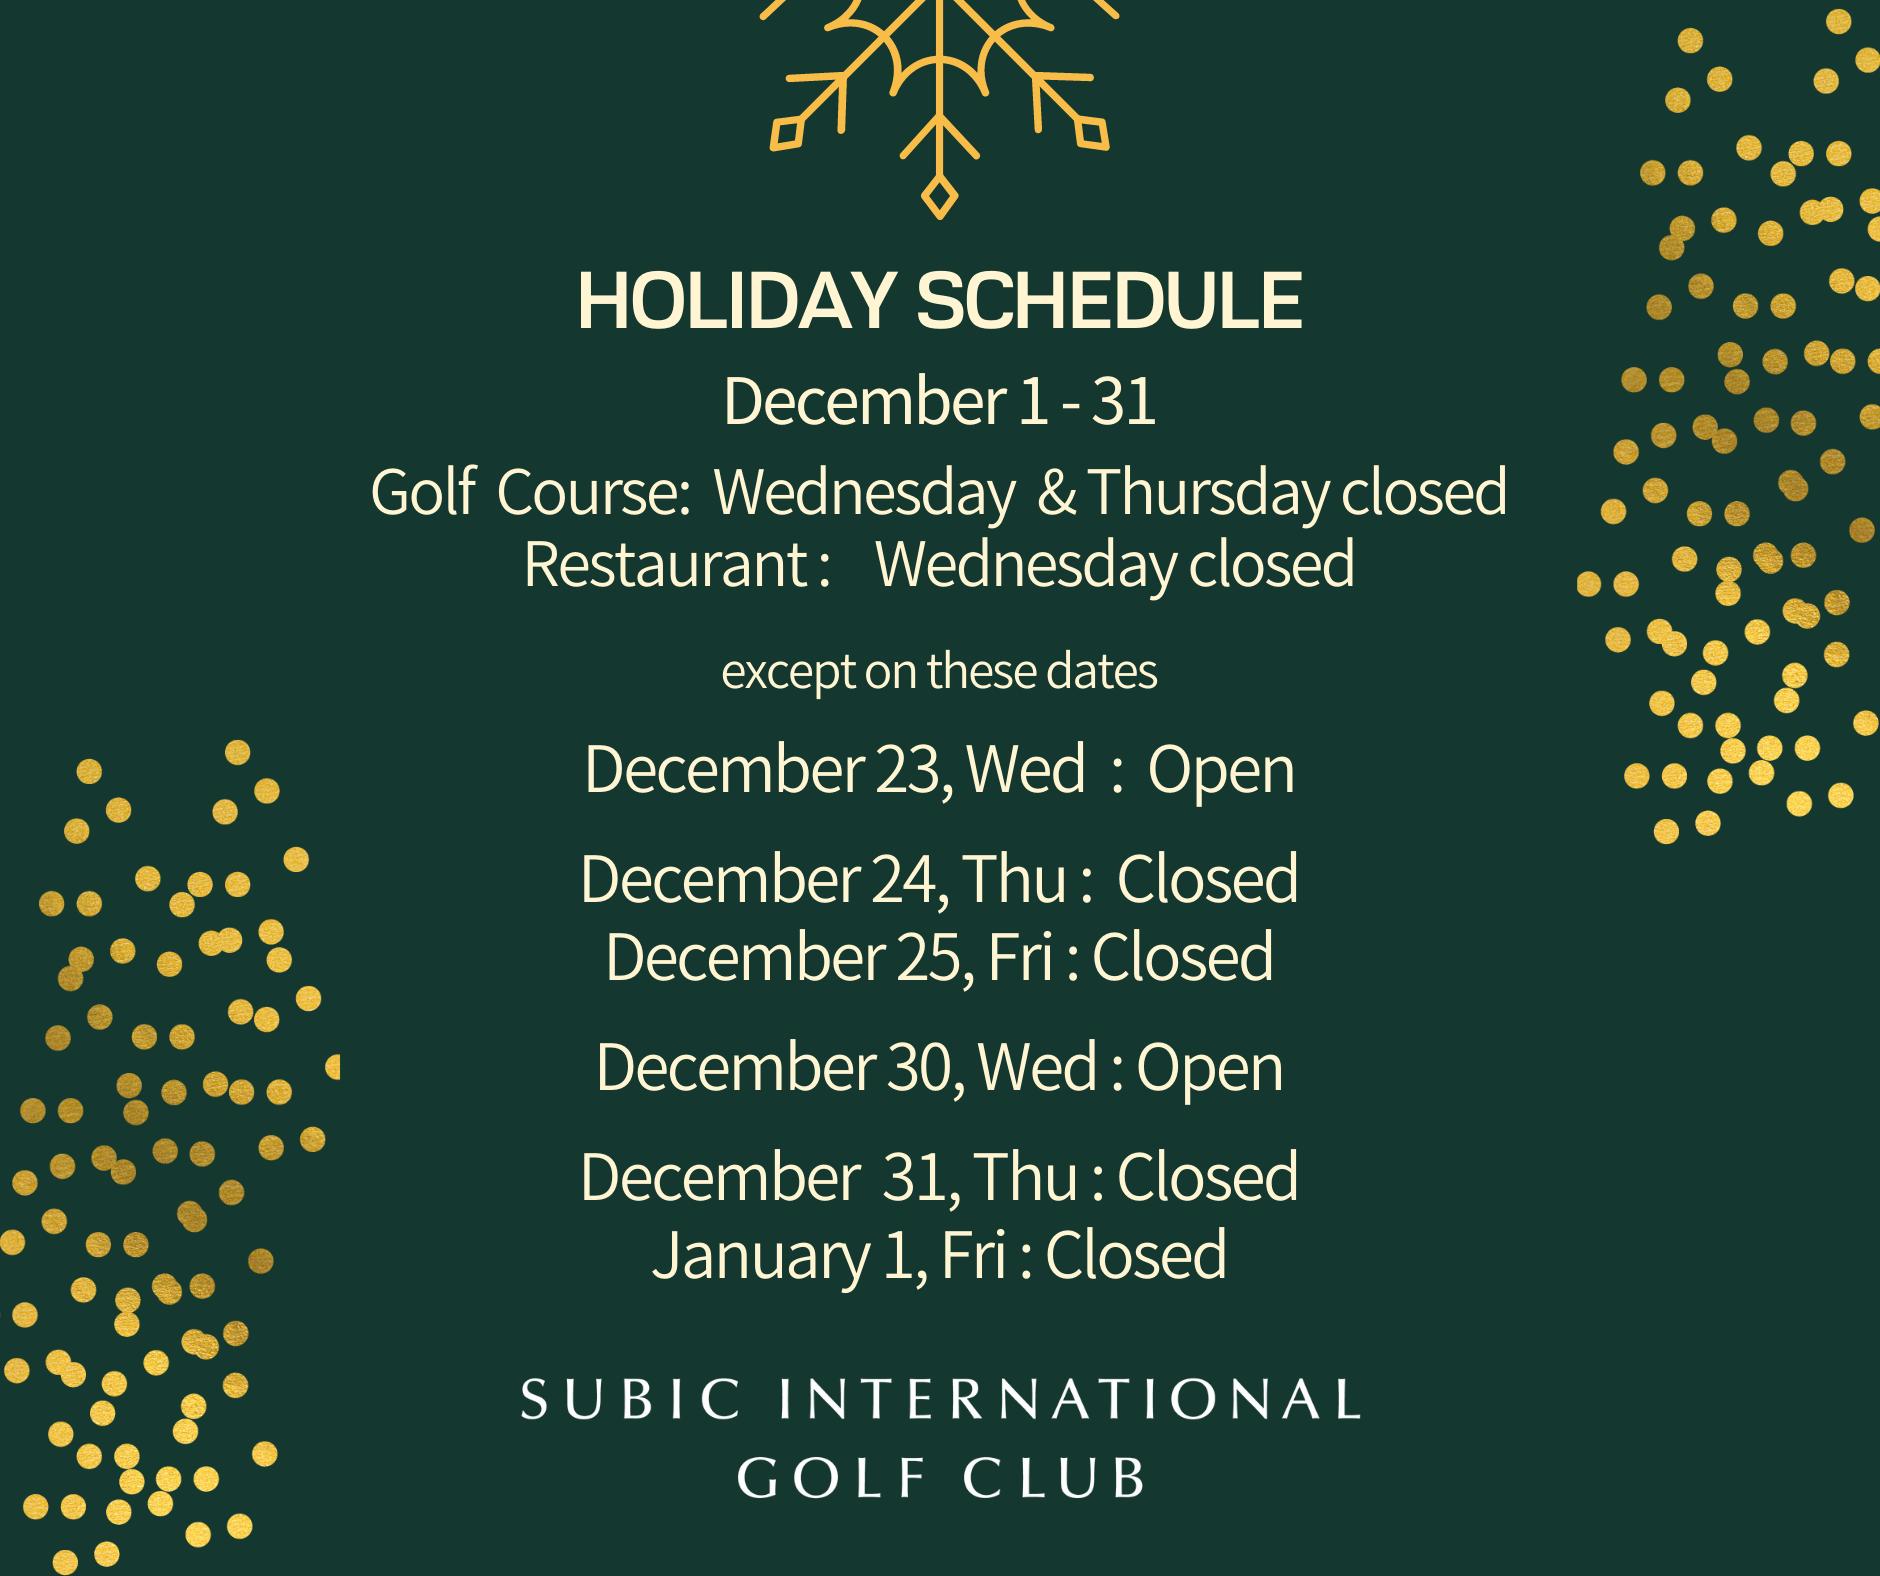 SIGC Holiday Schedule 2020-2021 | Subic International Golf ...